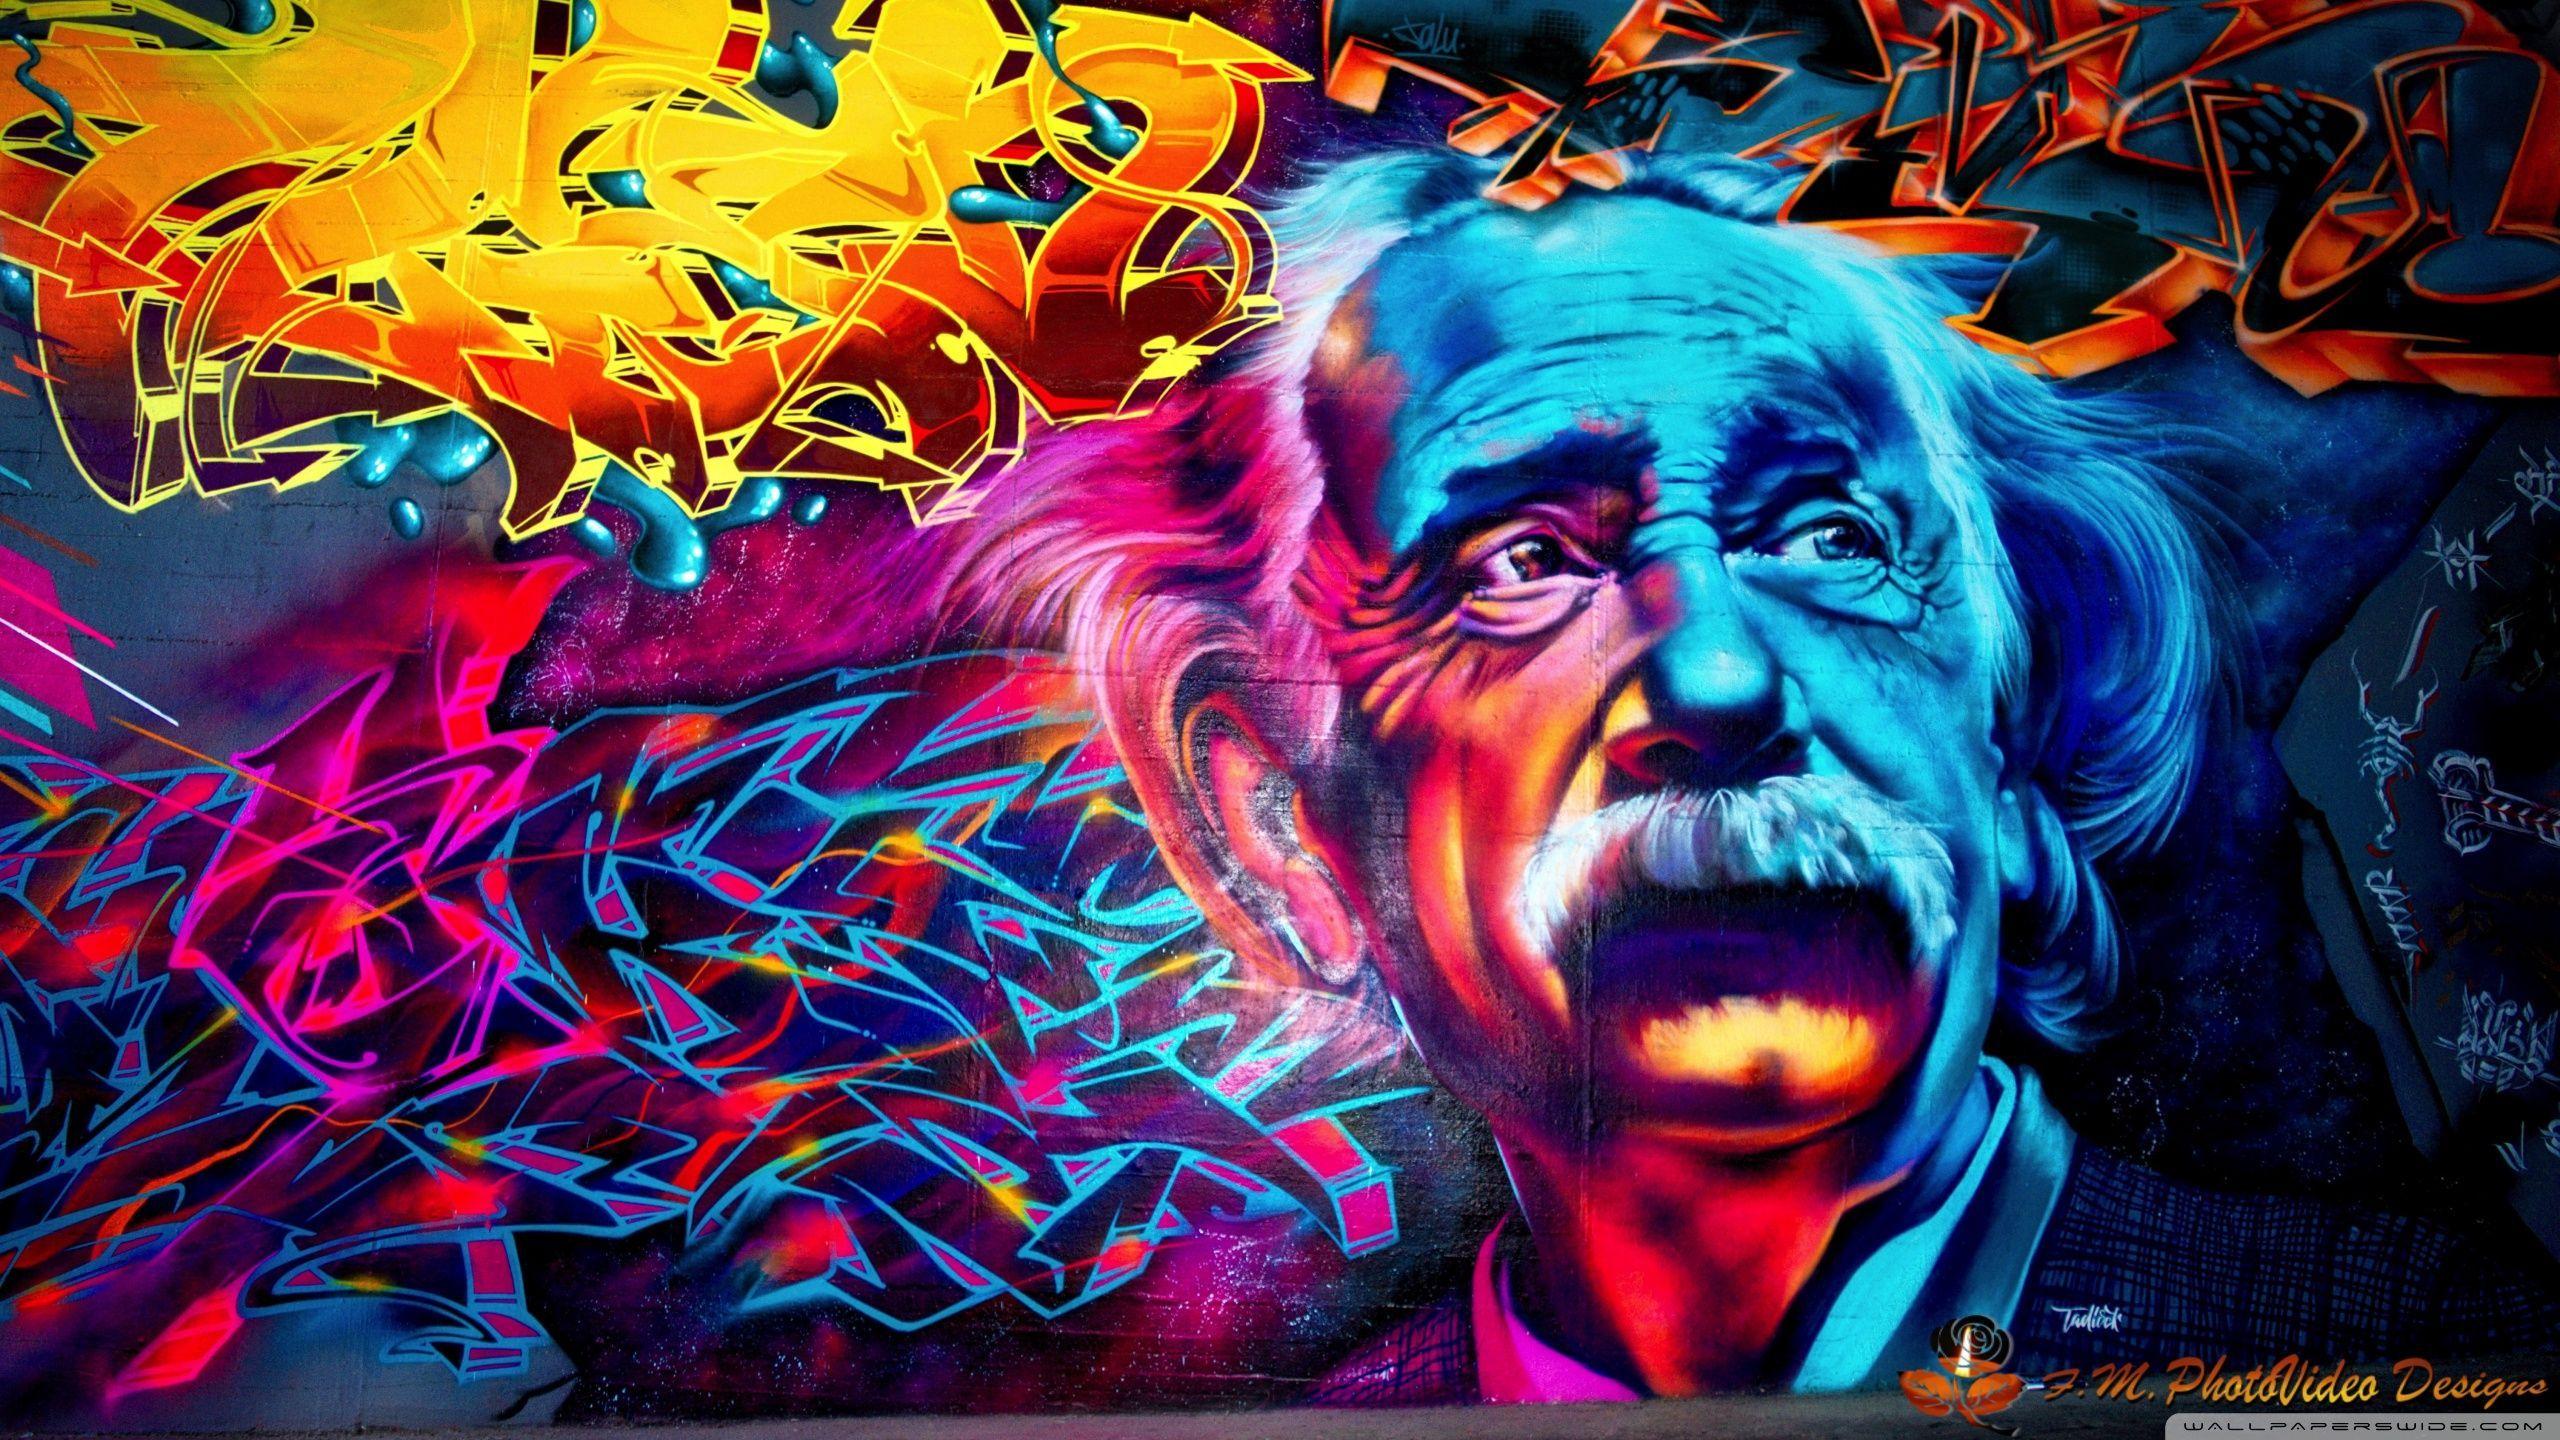 Urban Graffiti Art Wallpapers On Wallpaperdog